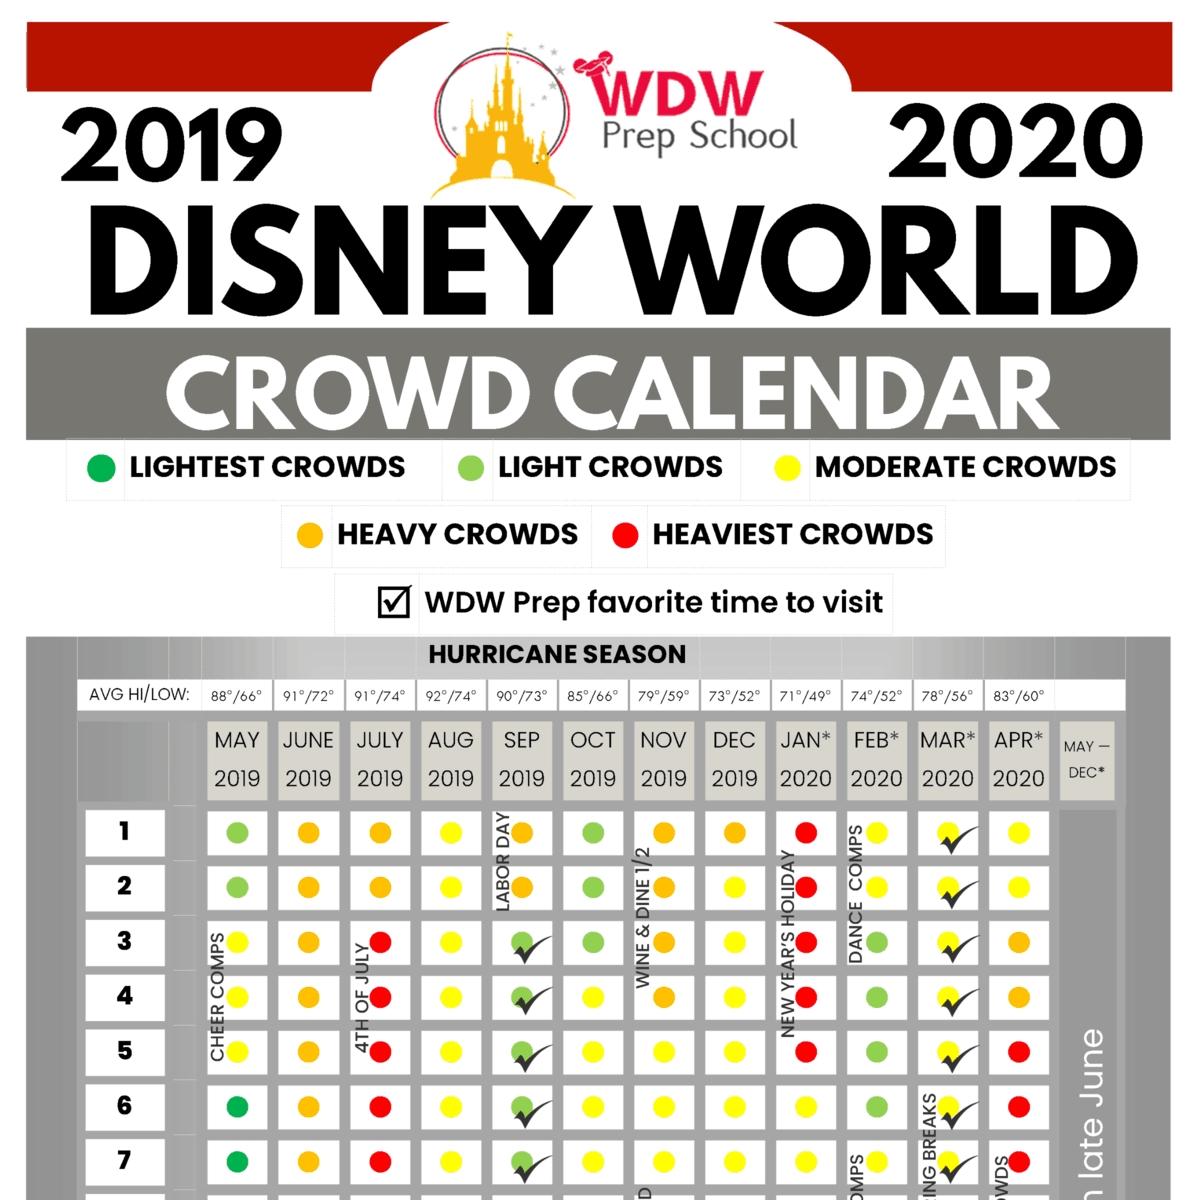 Disney World 2019 & 2020 Crowd Calendar (Best Times To Go-Disney World Crowd Calendar January 2020